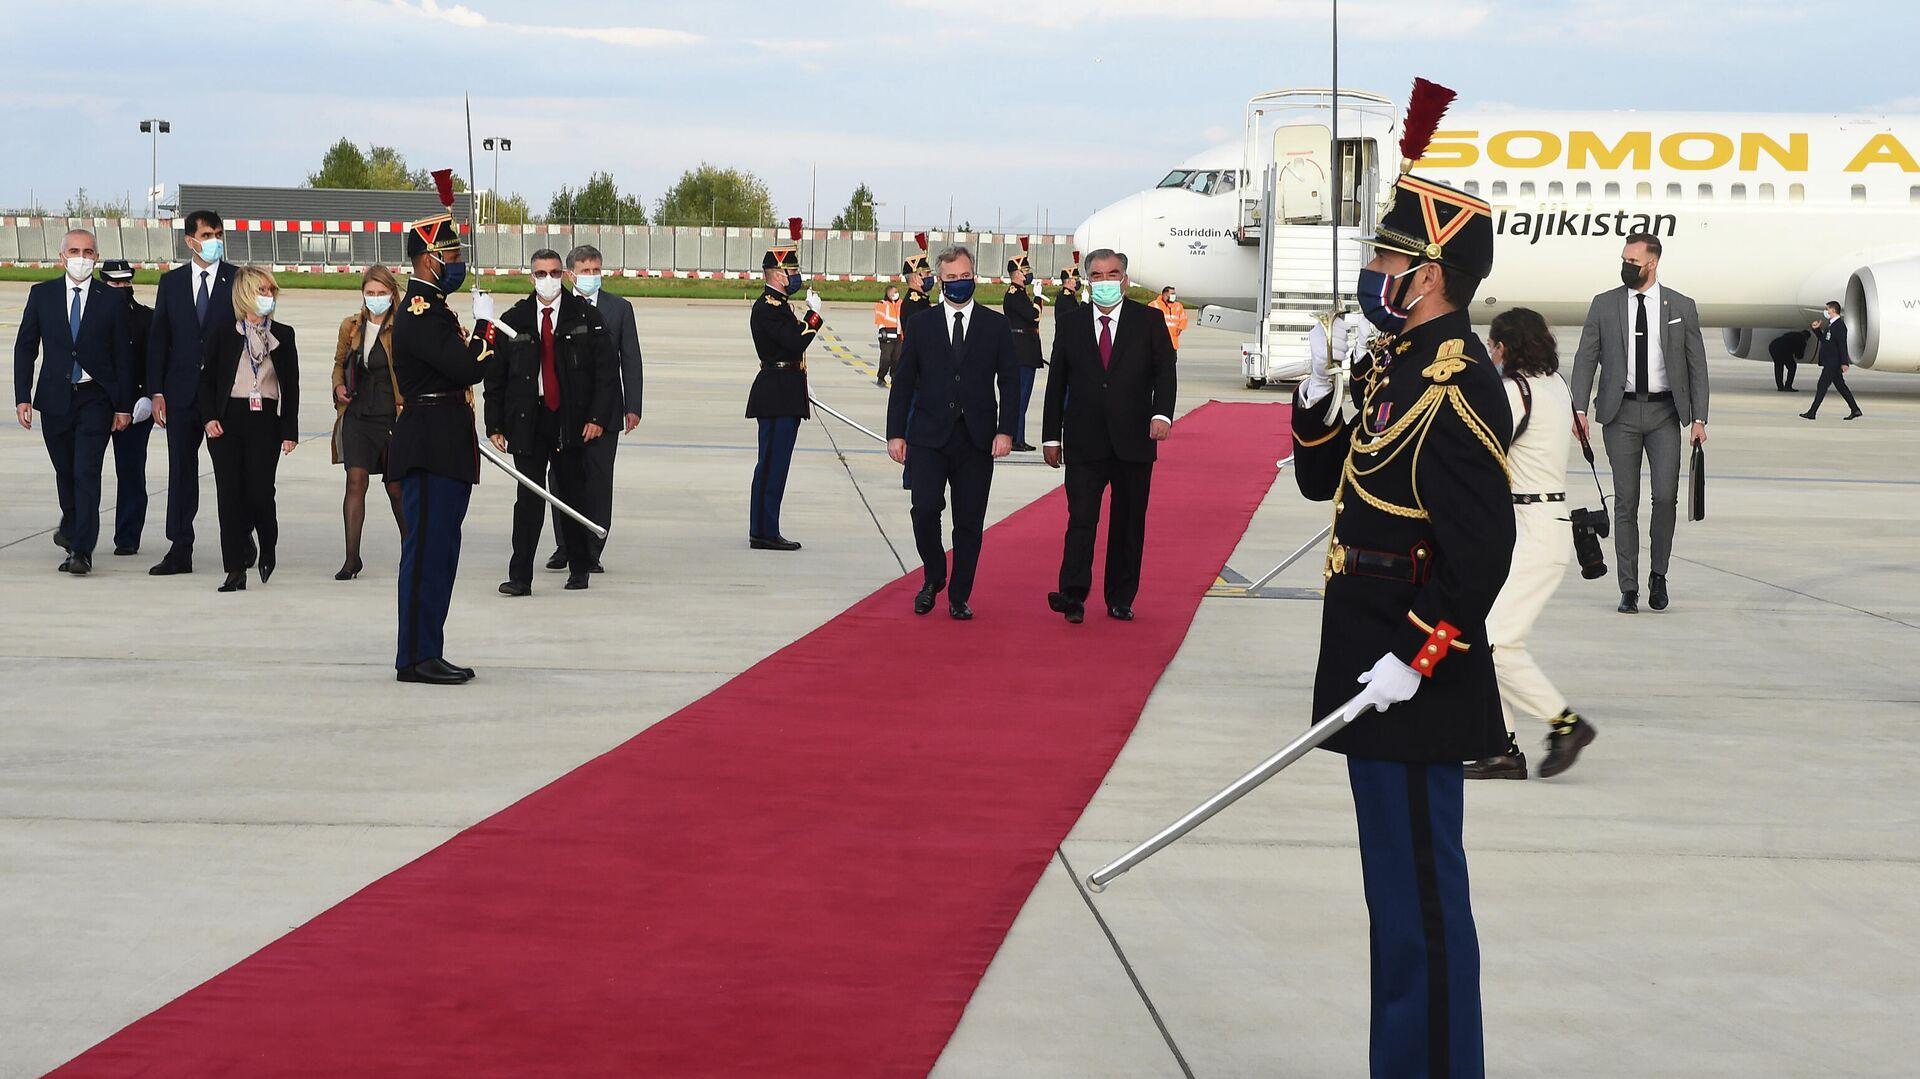 Эмомали Рахмон прибыл в Париж - Sputnik Таджикистан, 1920, 13.10.2021